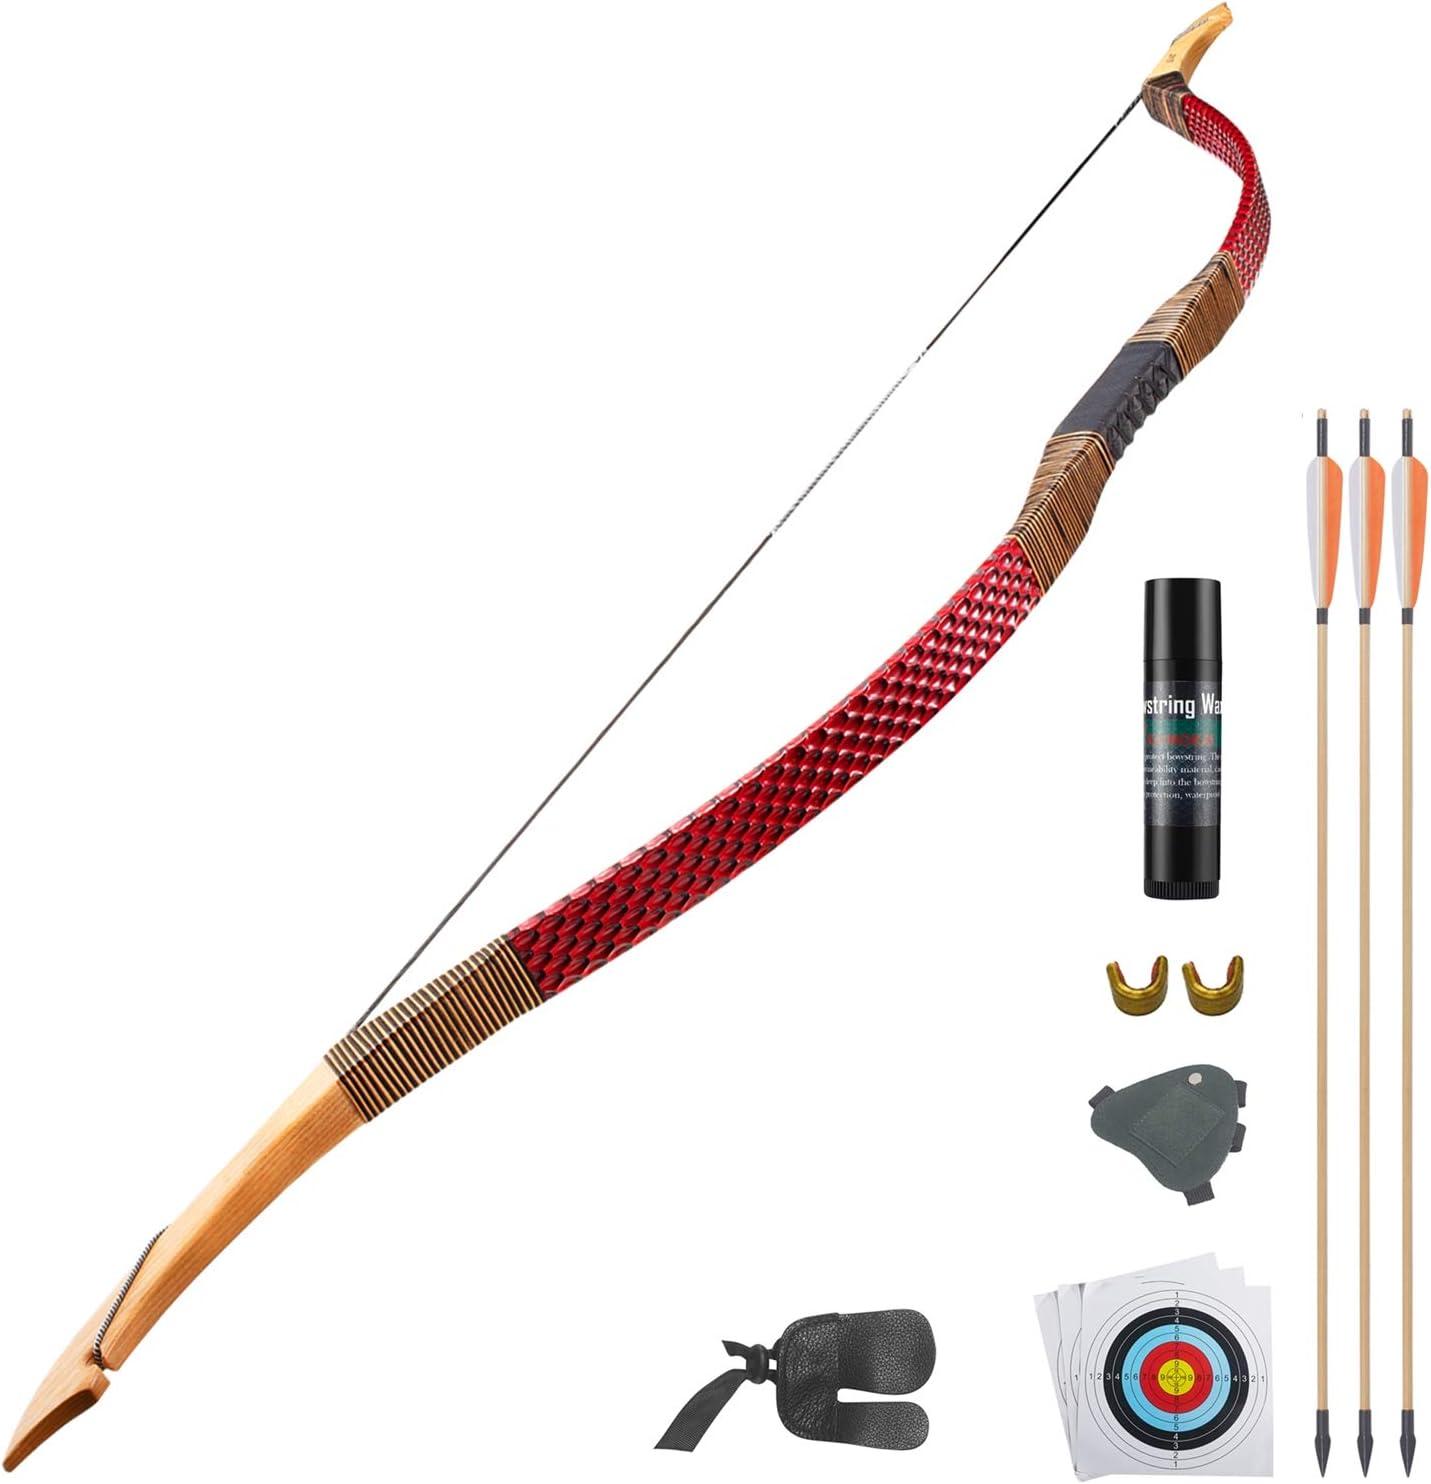 KAINOKAI Traditional Handmade Archery Bow